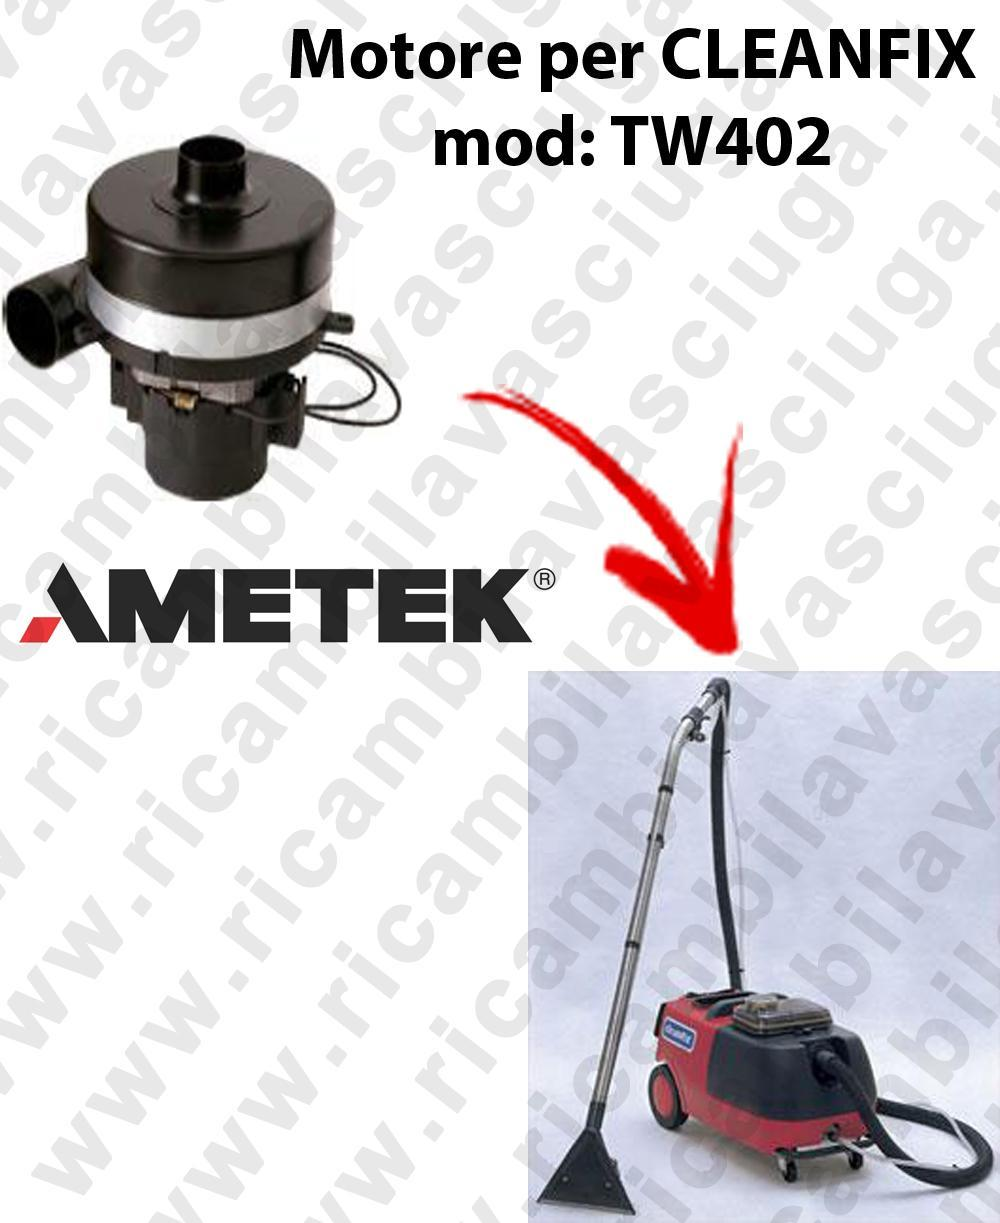 TW402 AMETEK Vacuum motor for vacuum cleaner CLEANFIX